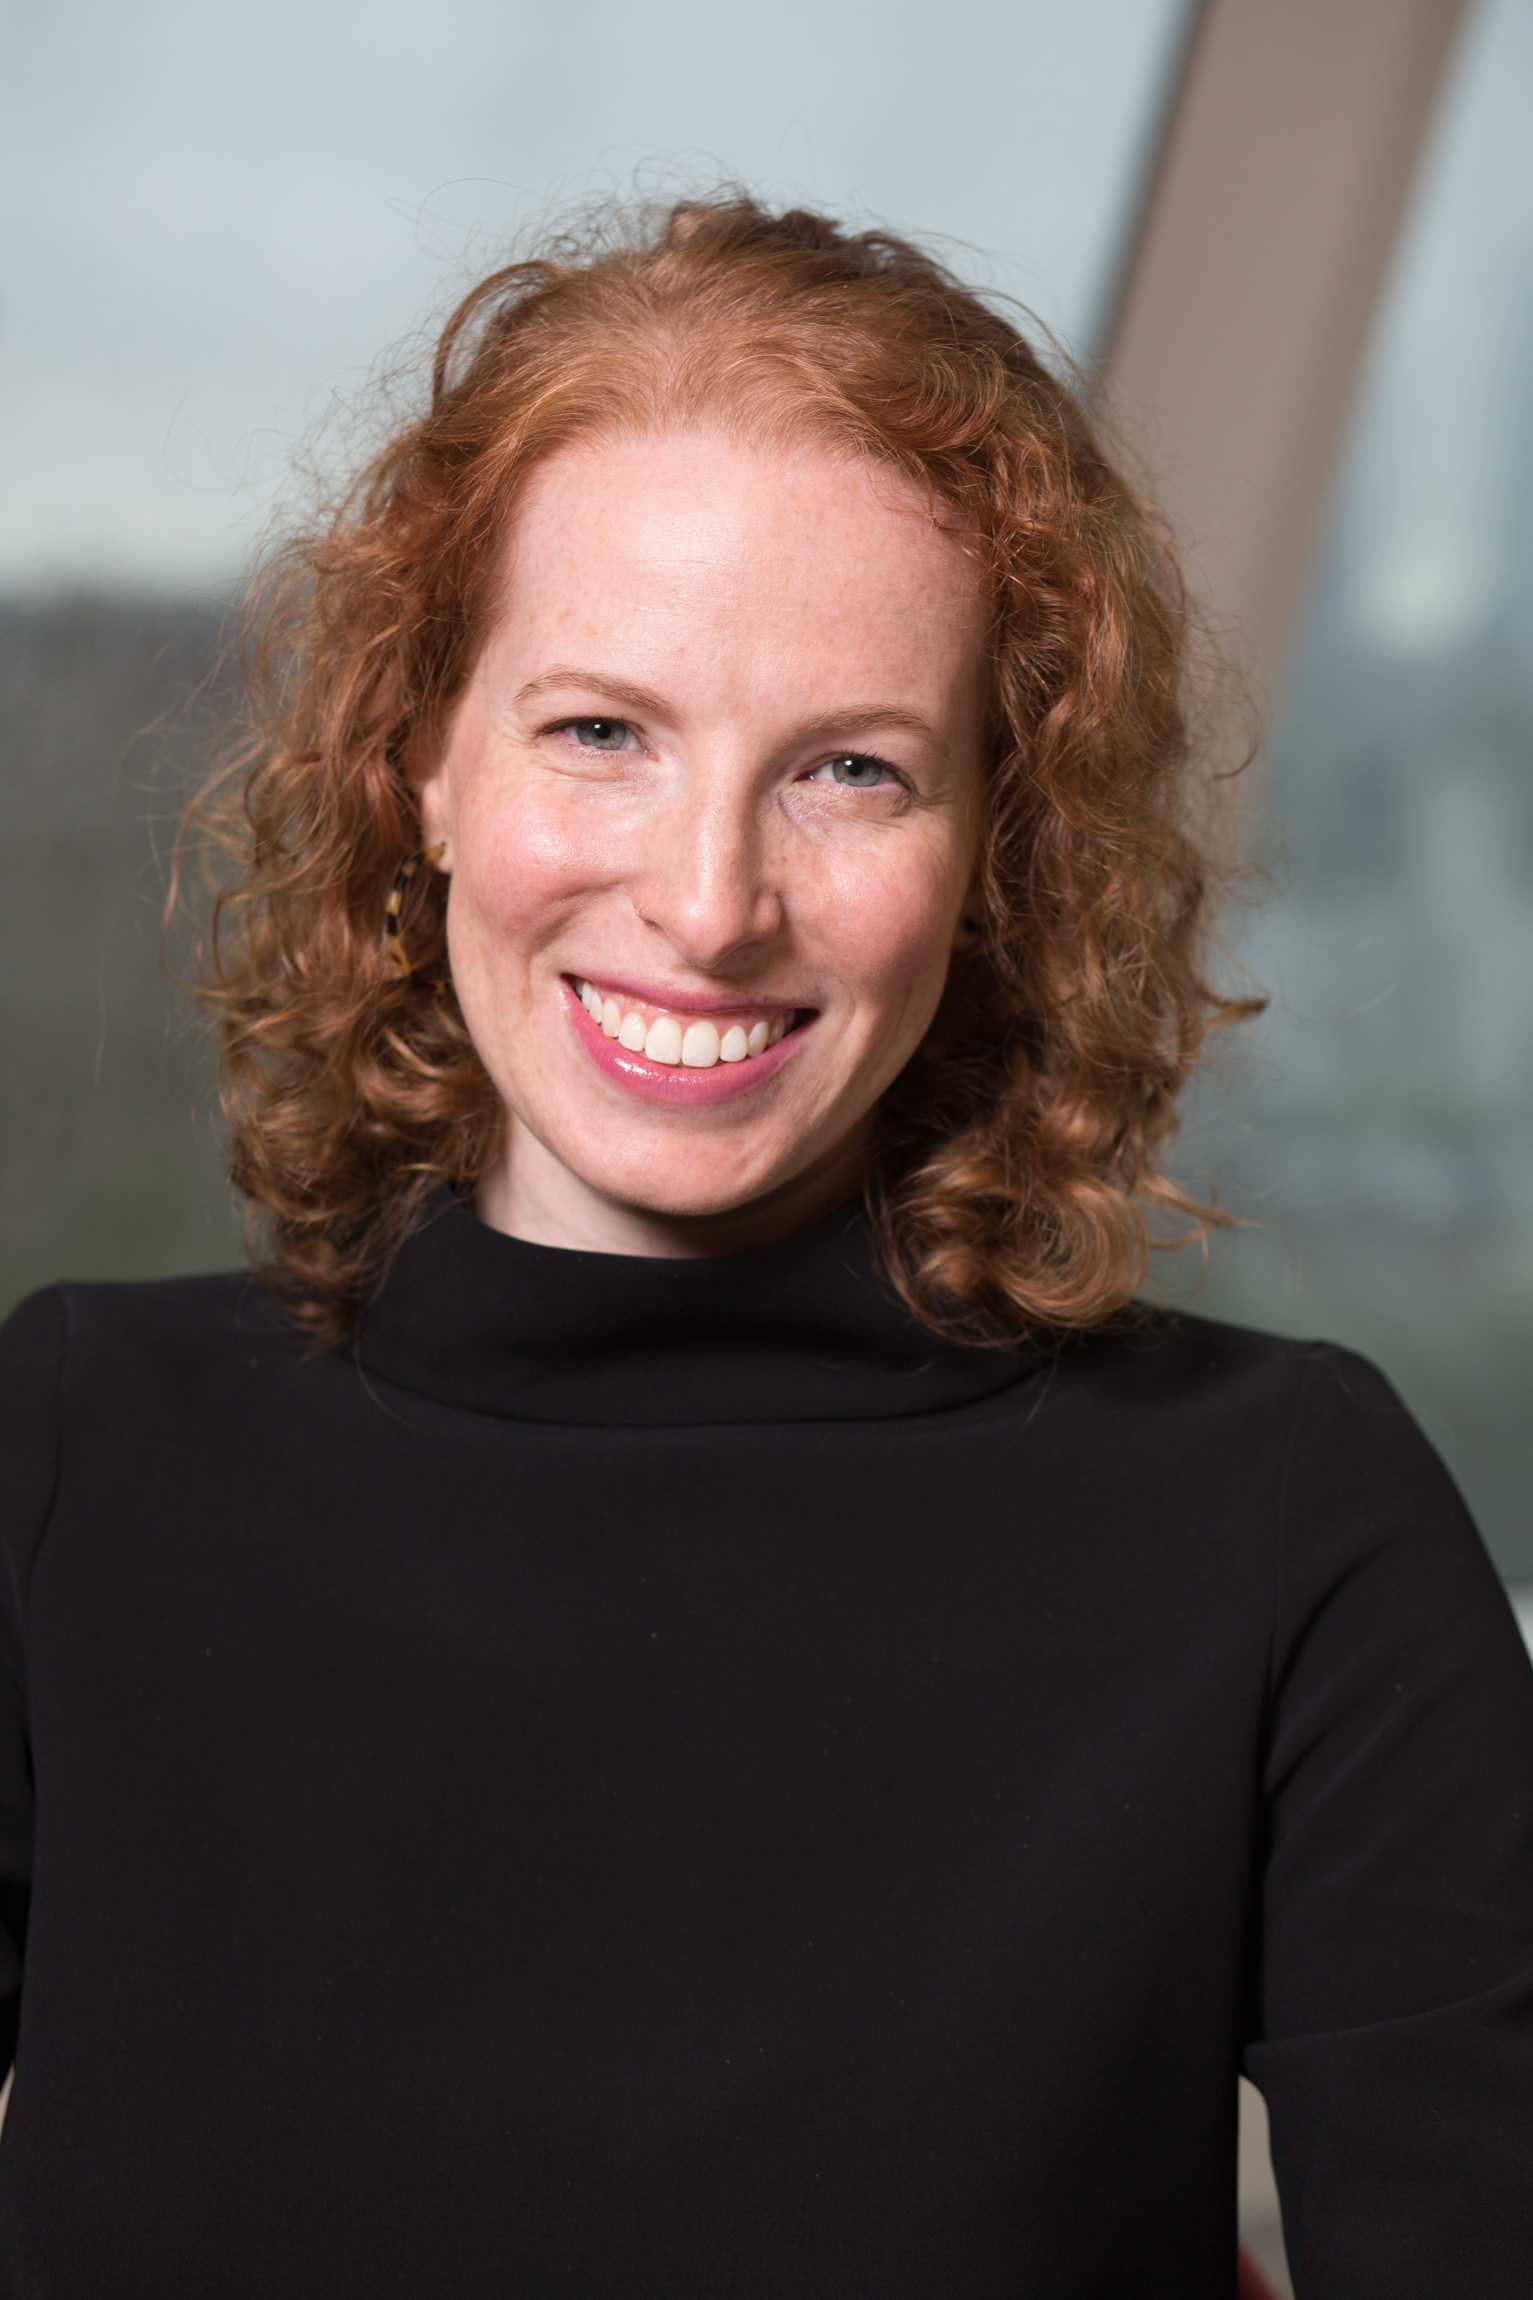 Sophie Rifkin